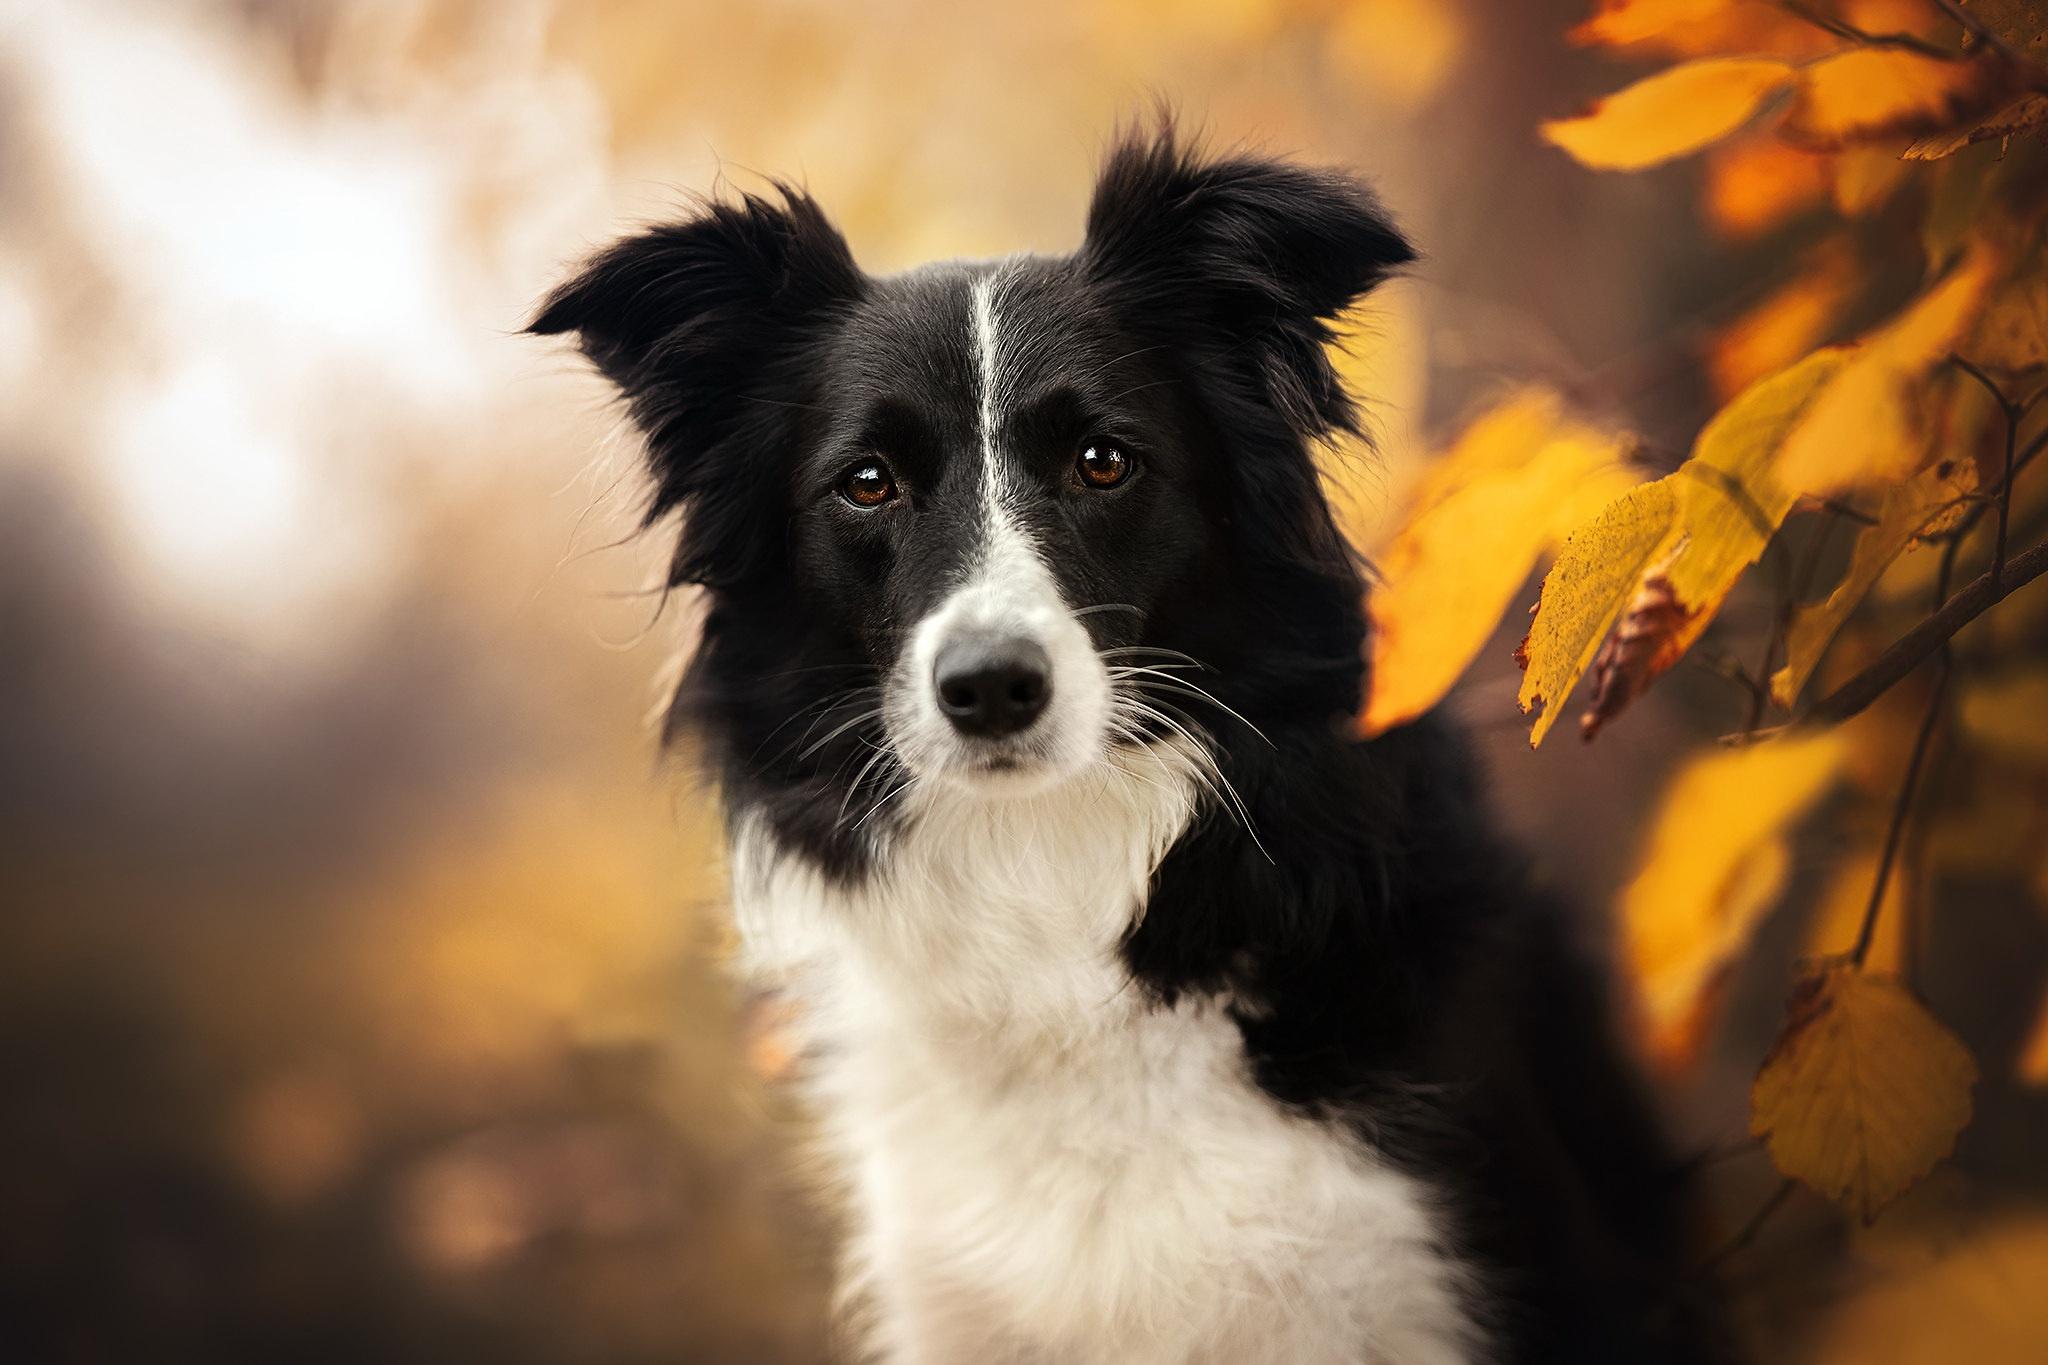 Dog Pet Depth Of Field 2048x1365